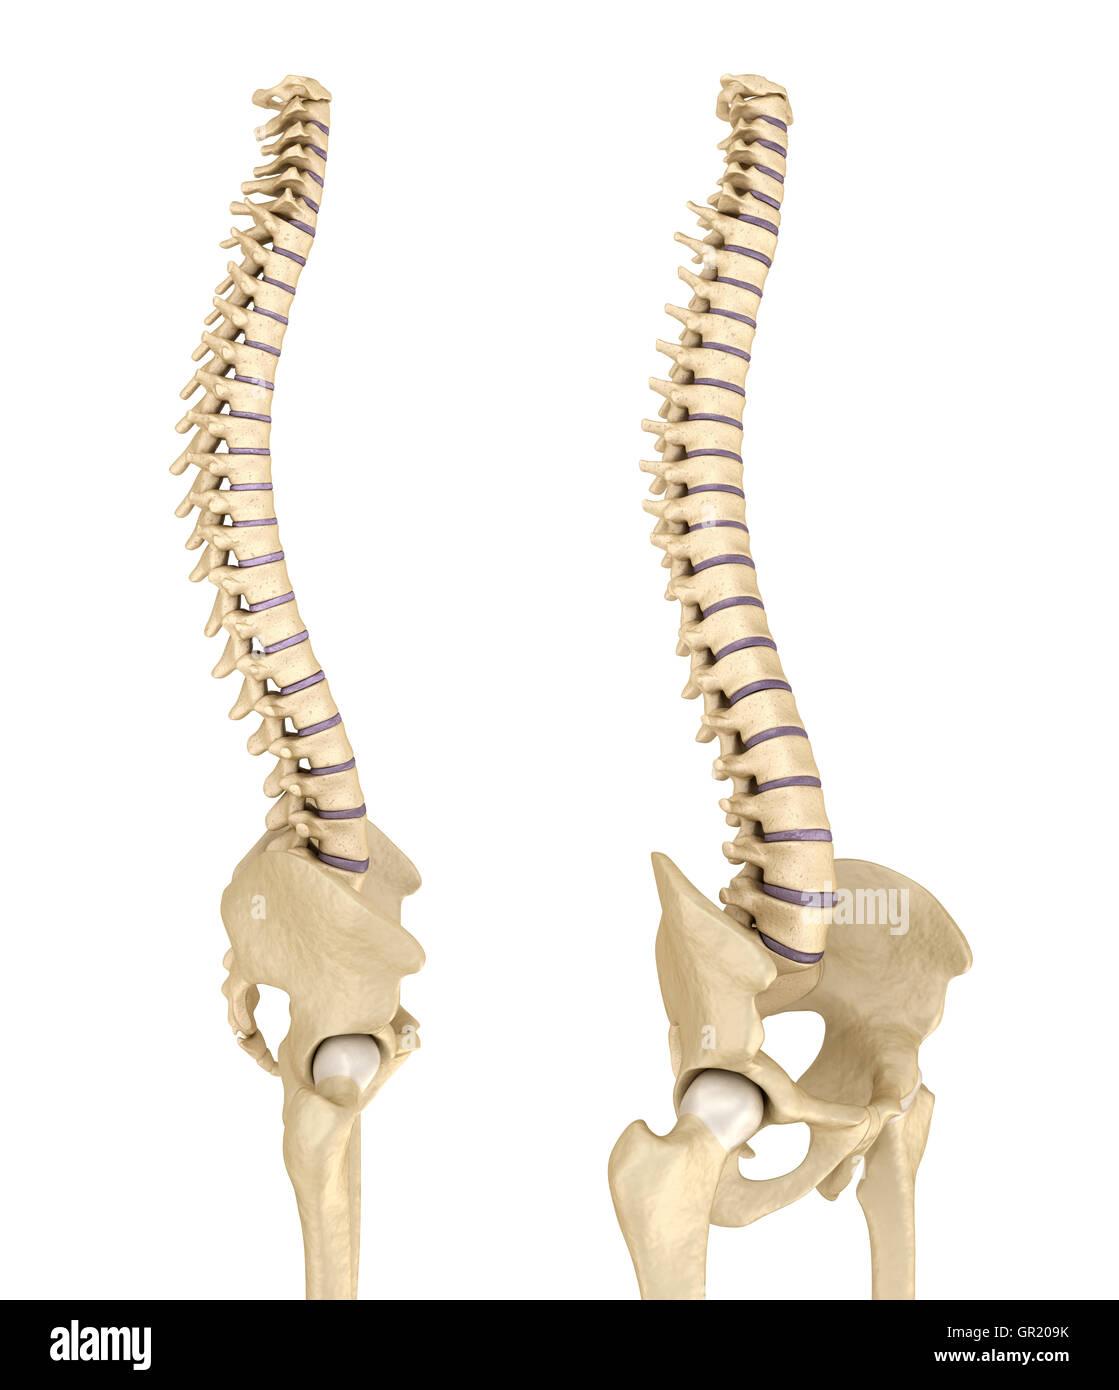 Wunderbar Beckenanatomie Abbildungen Ideen - Anatomie Ideen ...